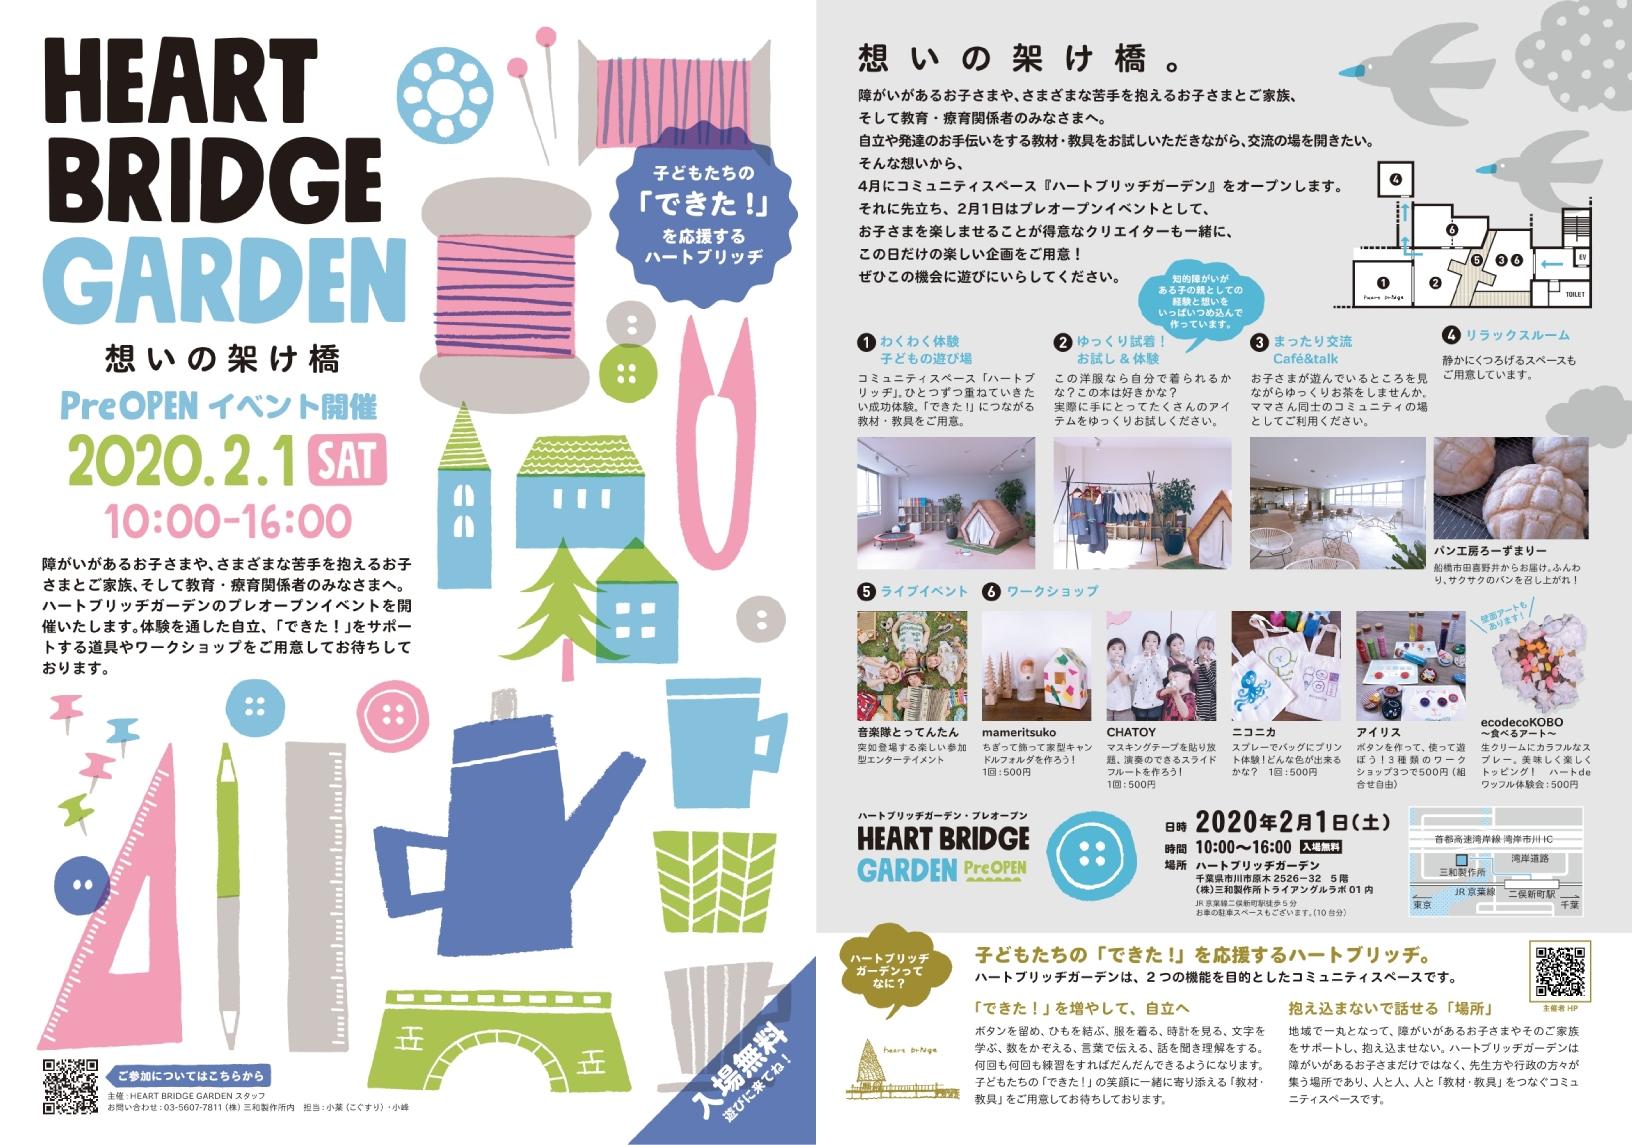 pamphlet0201-1-min.jpg